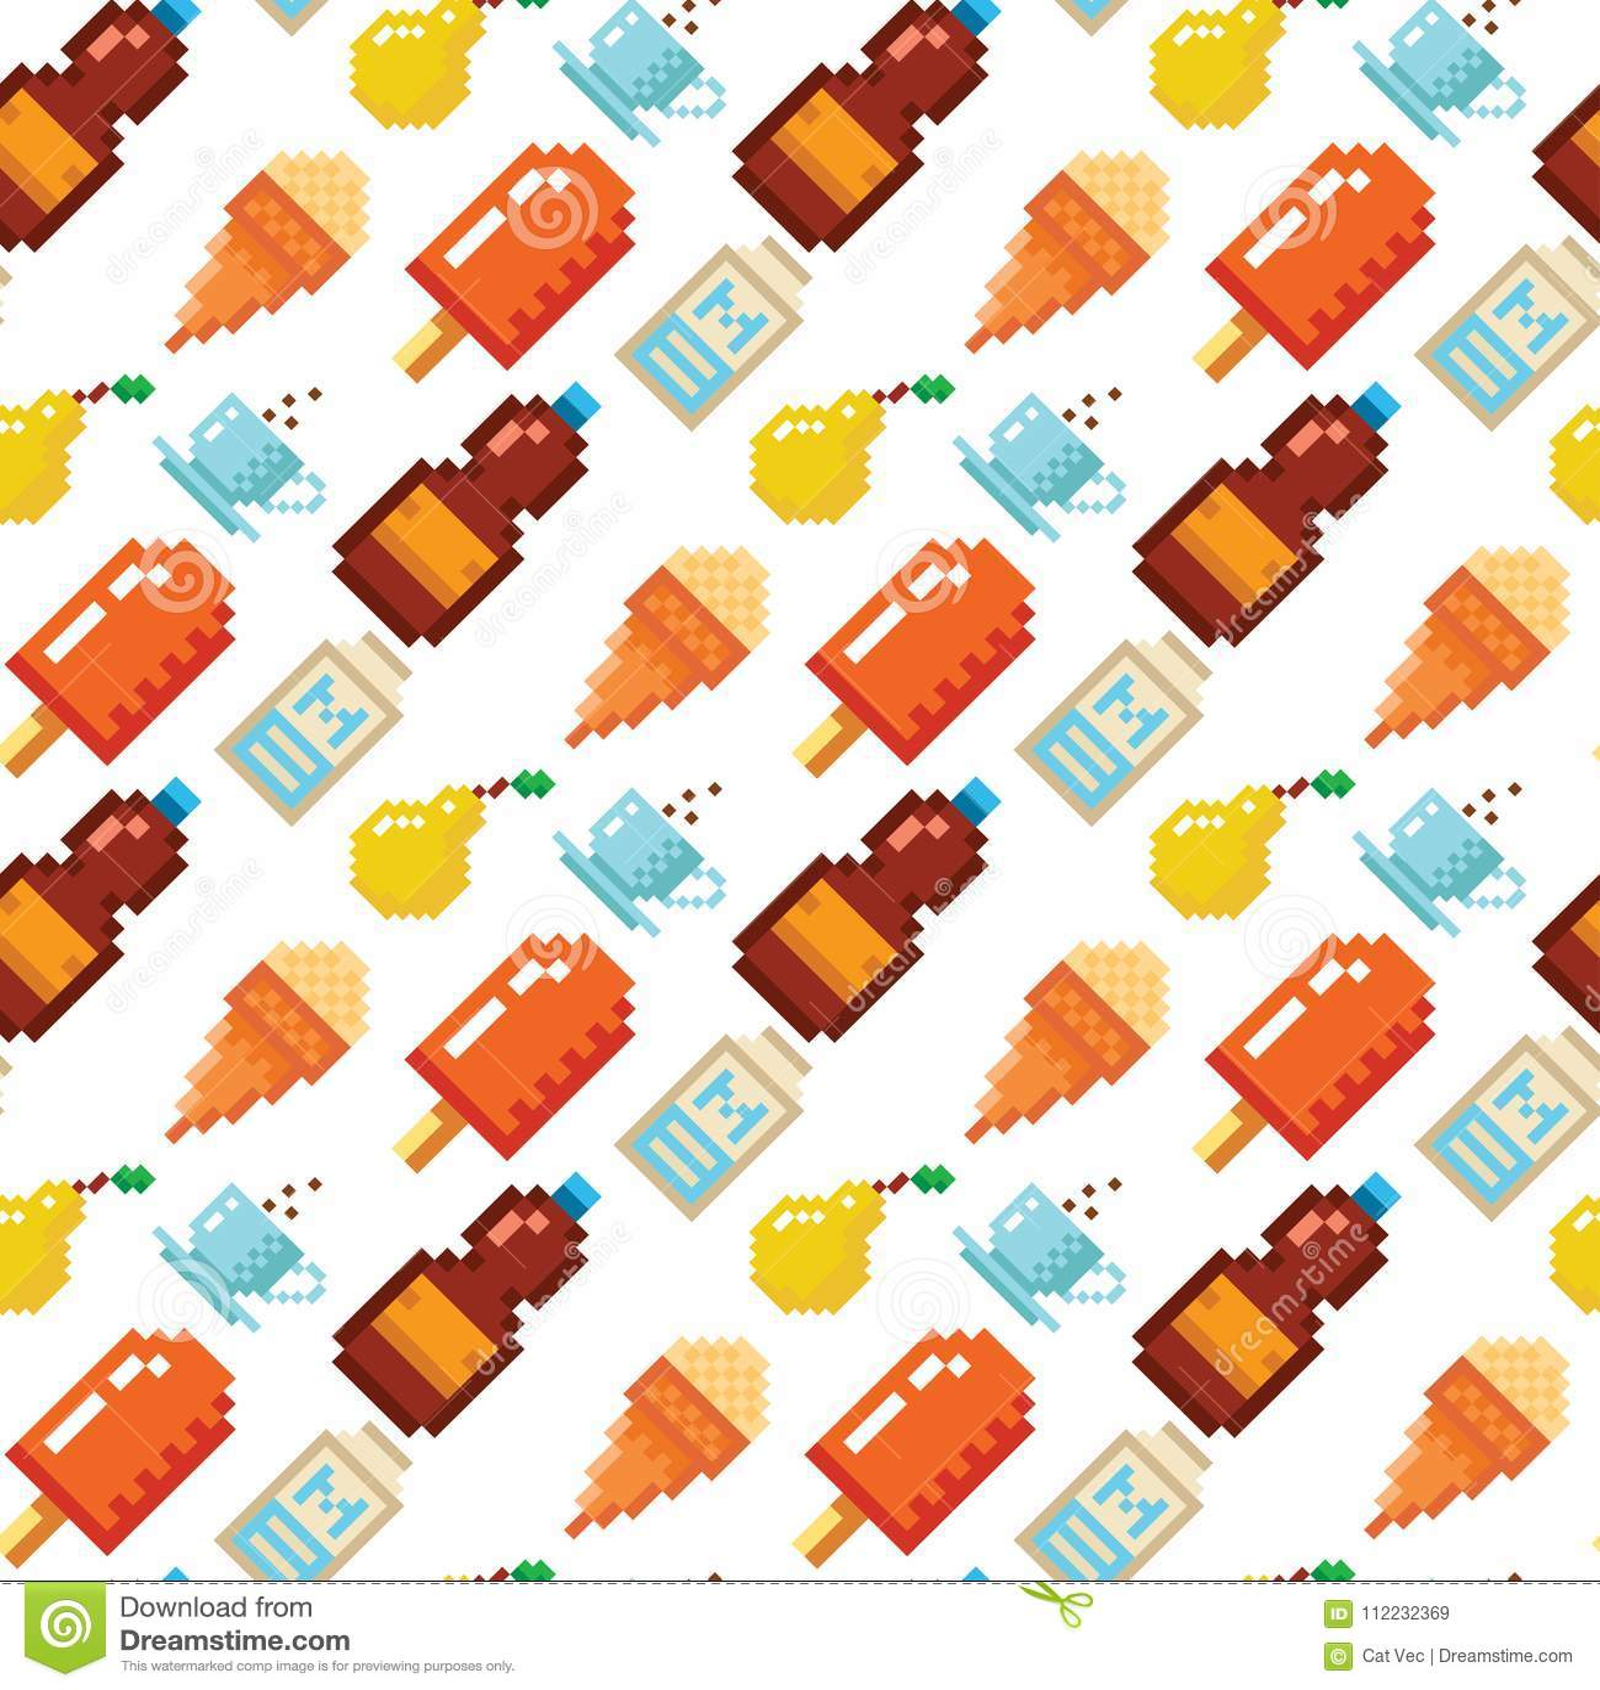 Pixel Art Food Computer Design Seamless Pattern Background Vector Illustration Restaurant Pixelated Element Fast Food Stock Vector Illustration Of Healthy Design 112232369